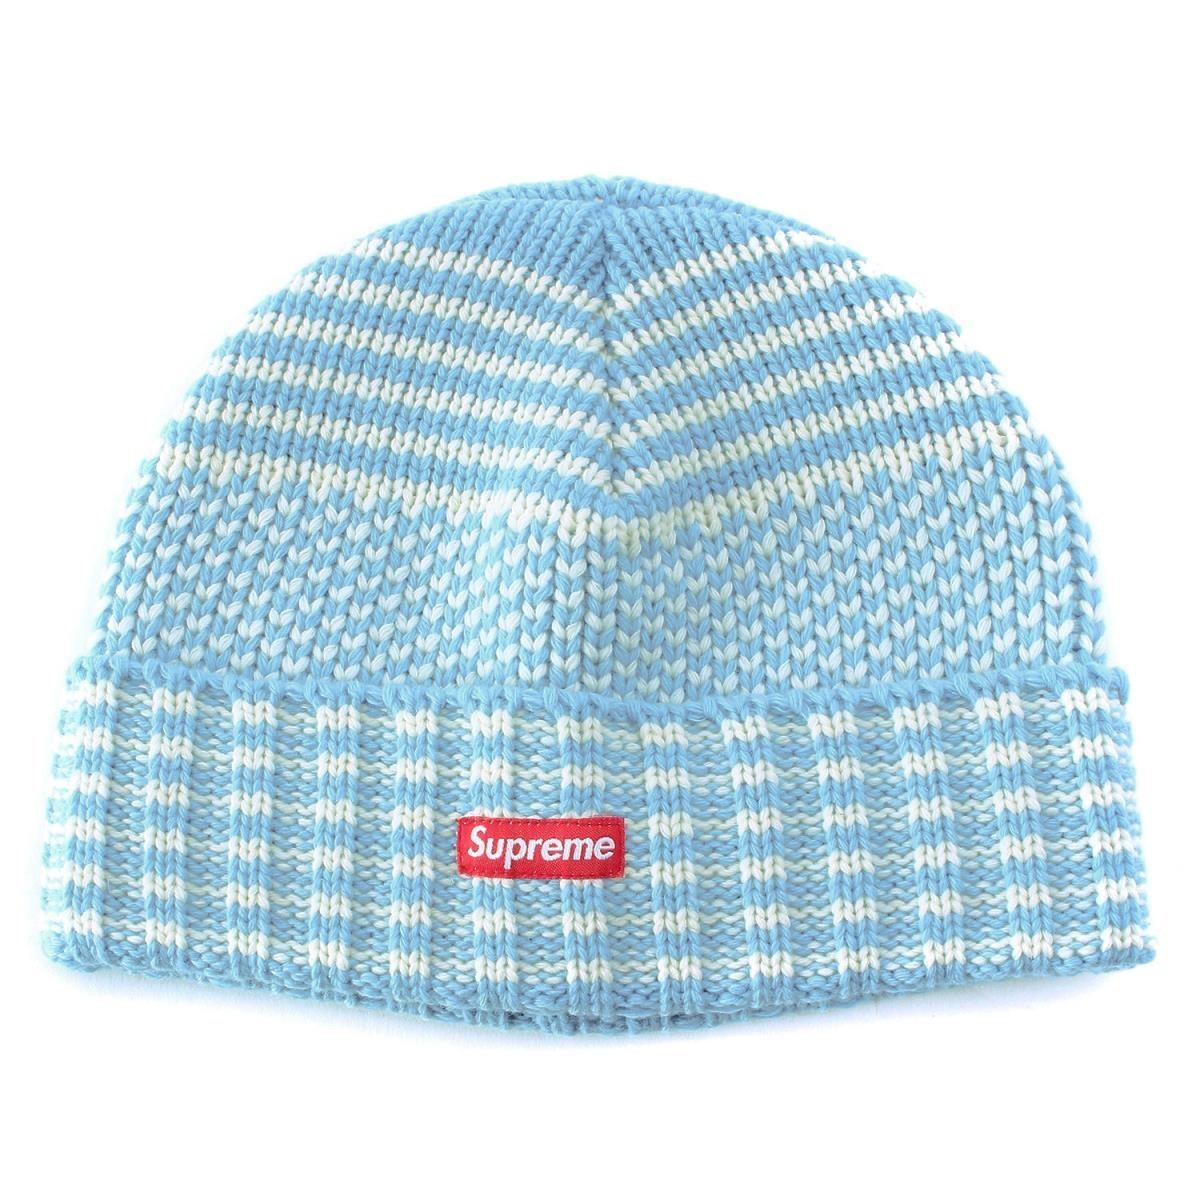 Supreme Wool Jacquard Beanie Light Blue